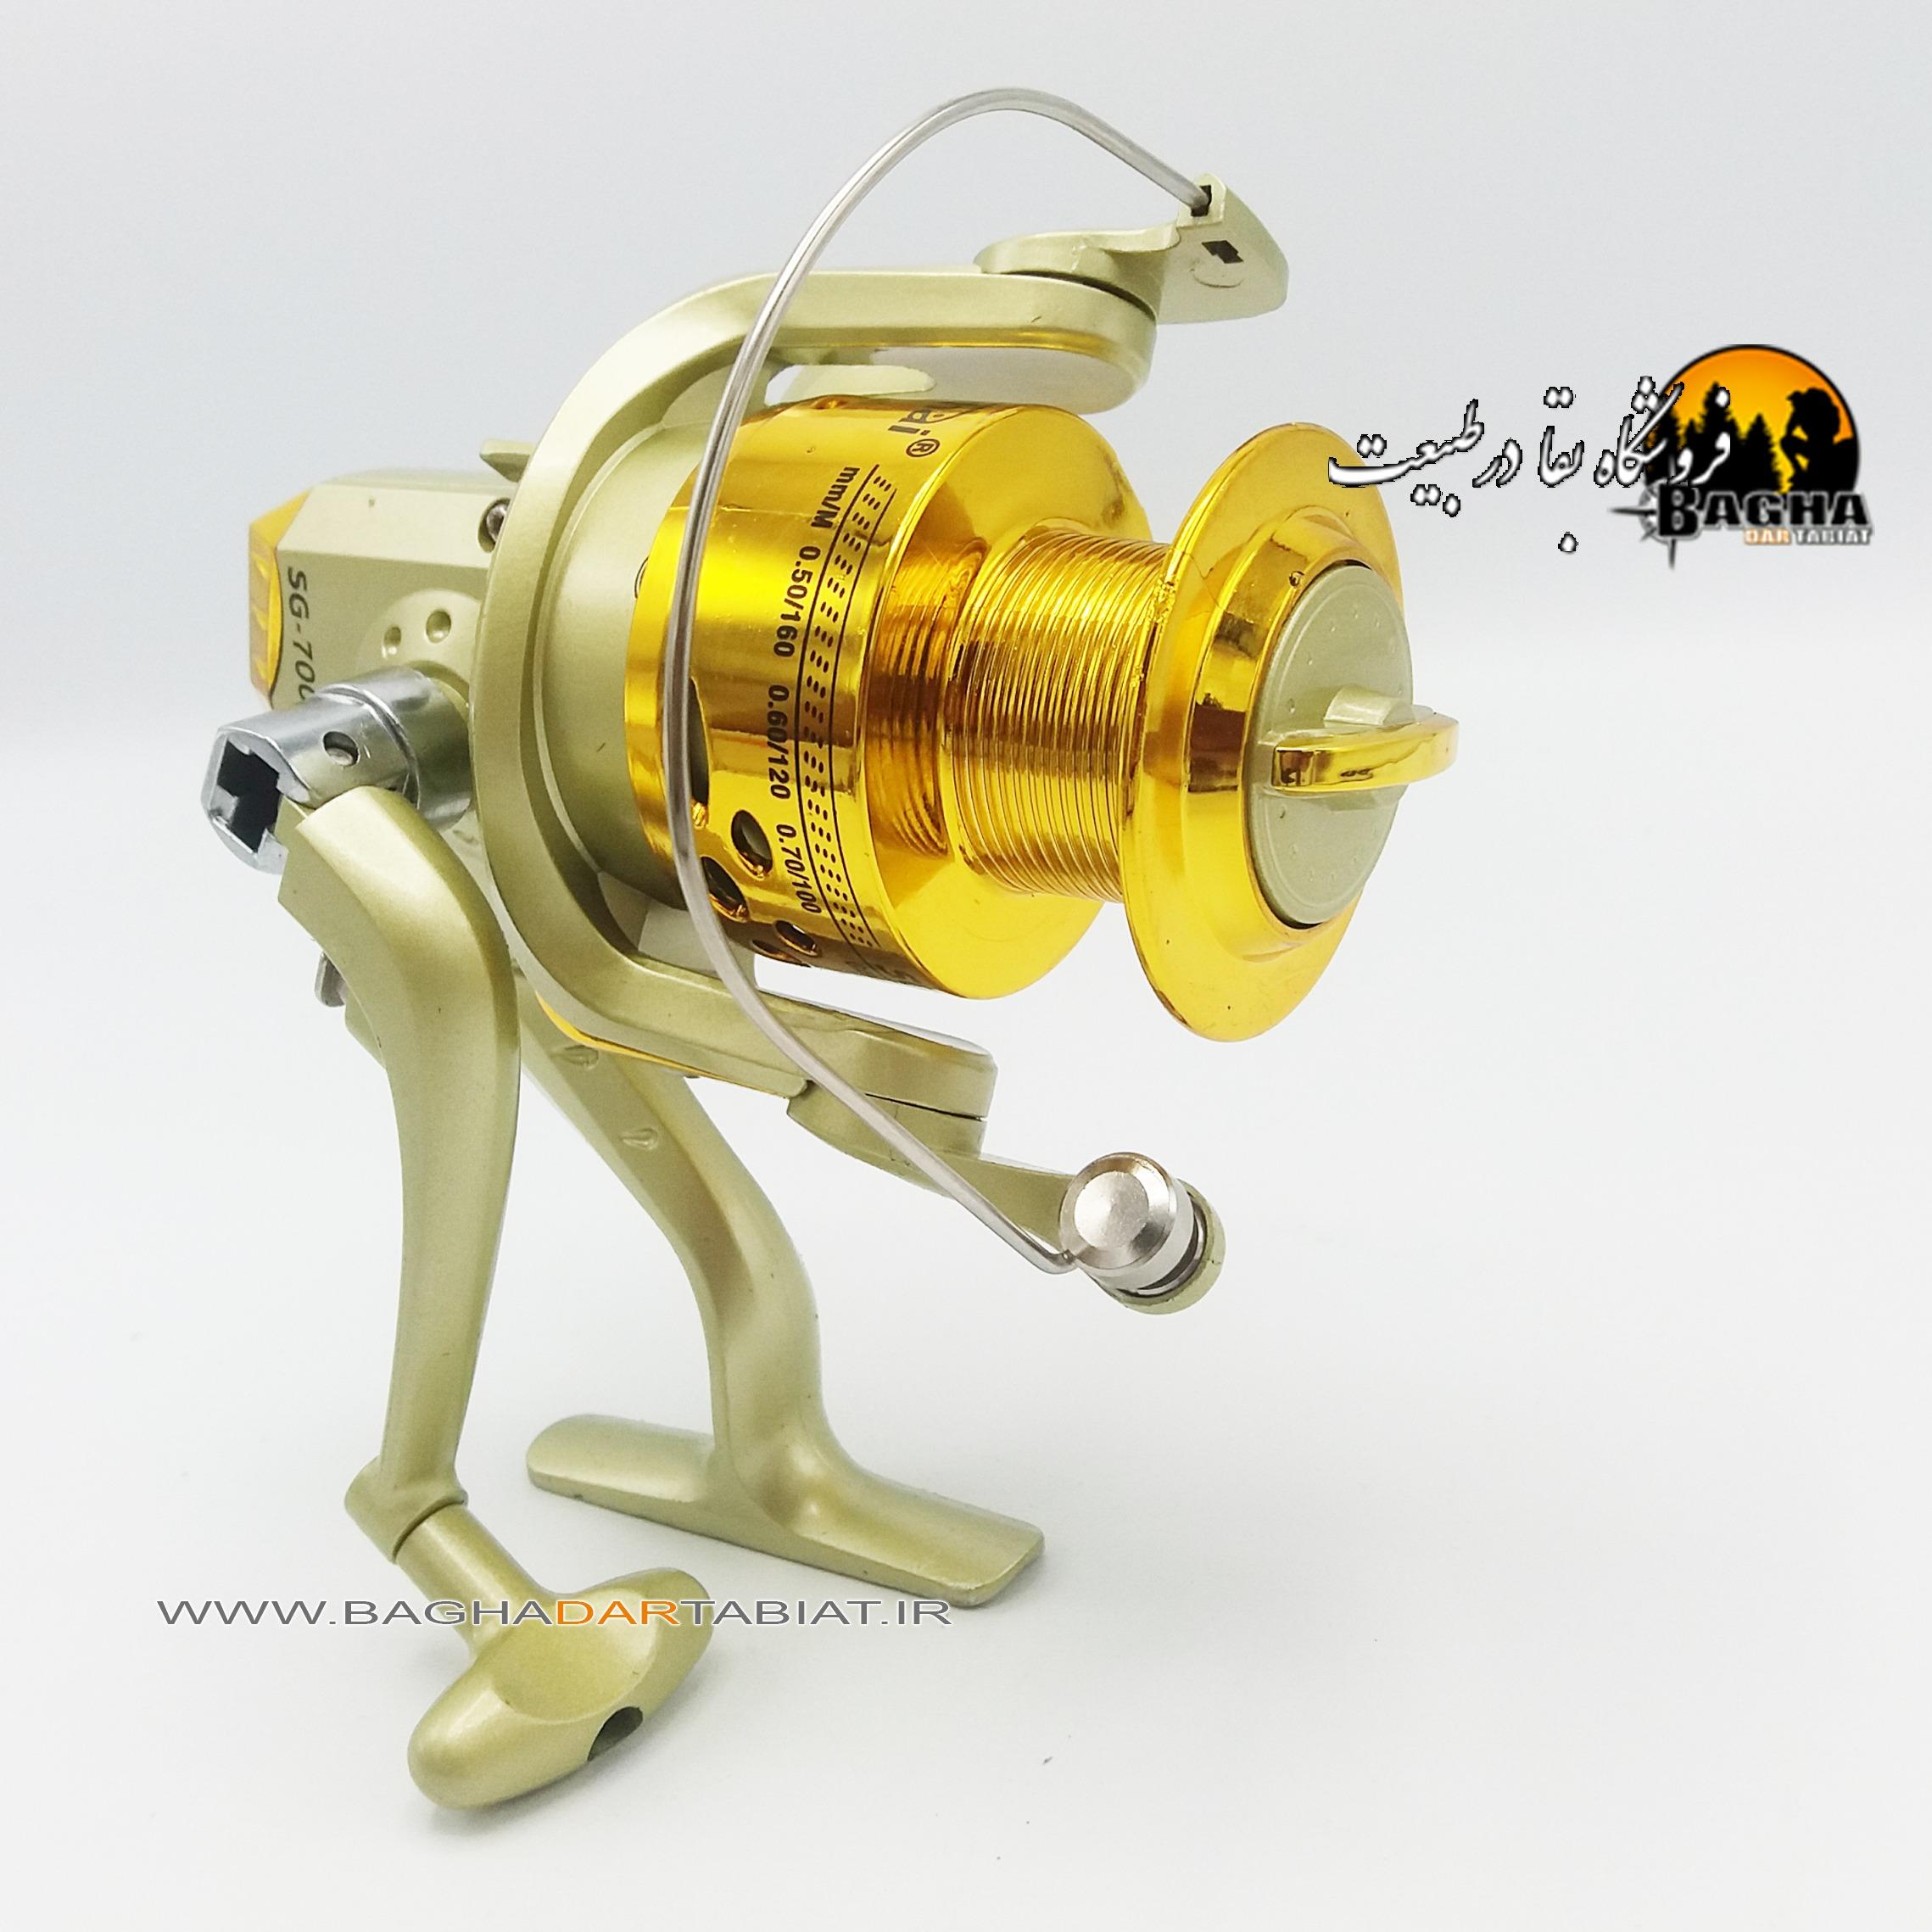 چرخ ماهیگیری QUNHAI REEL SG-7000